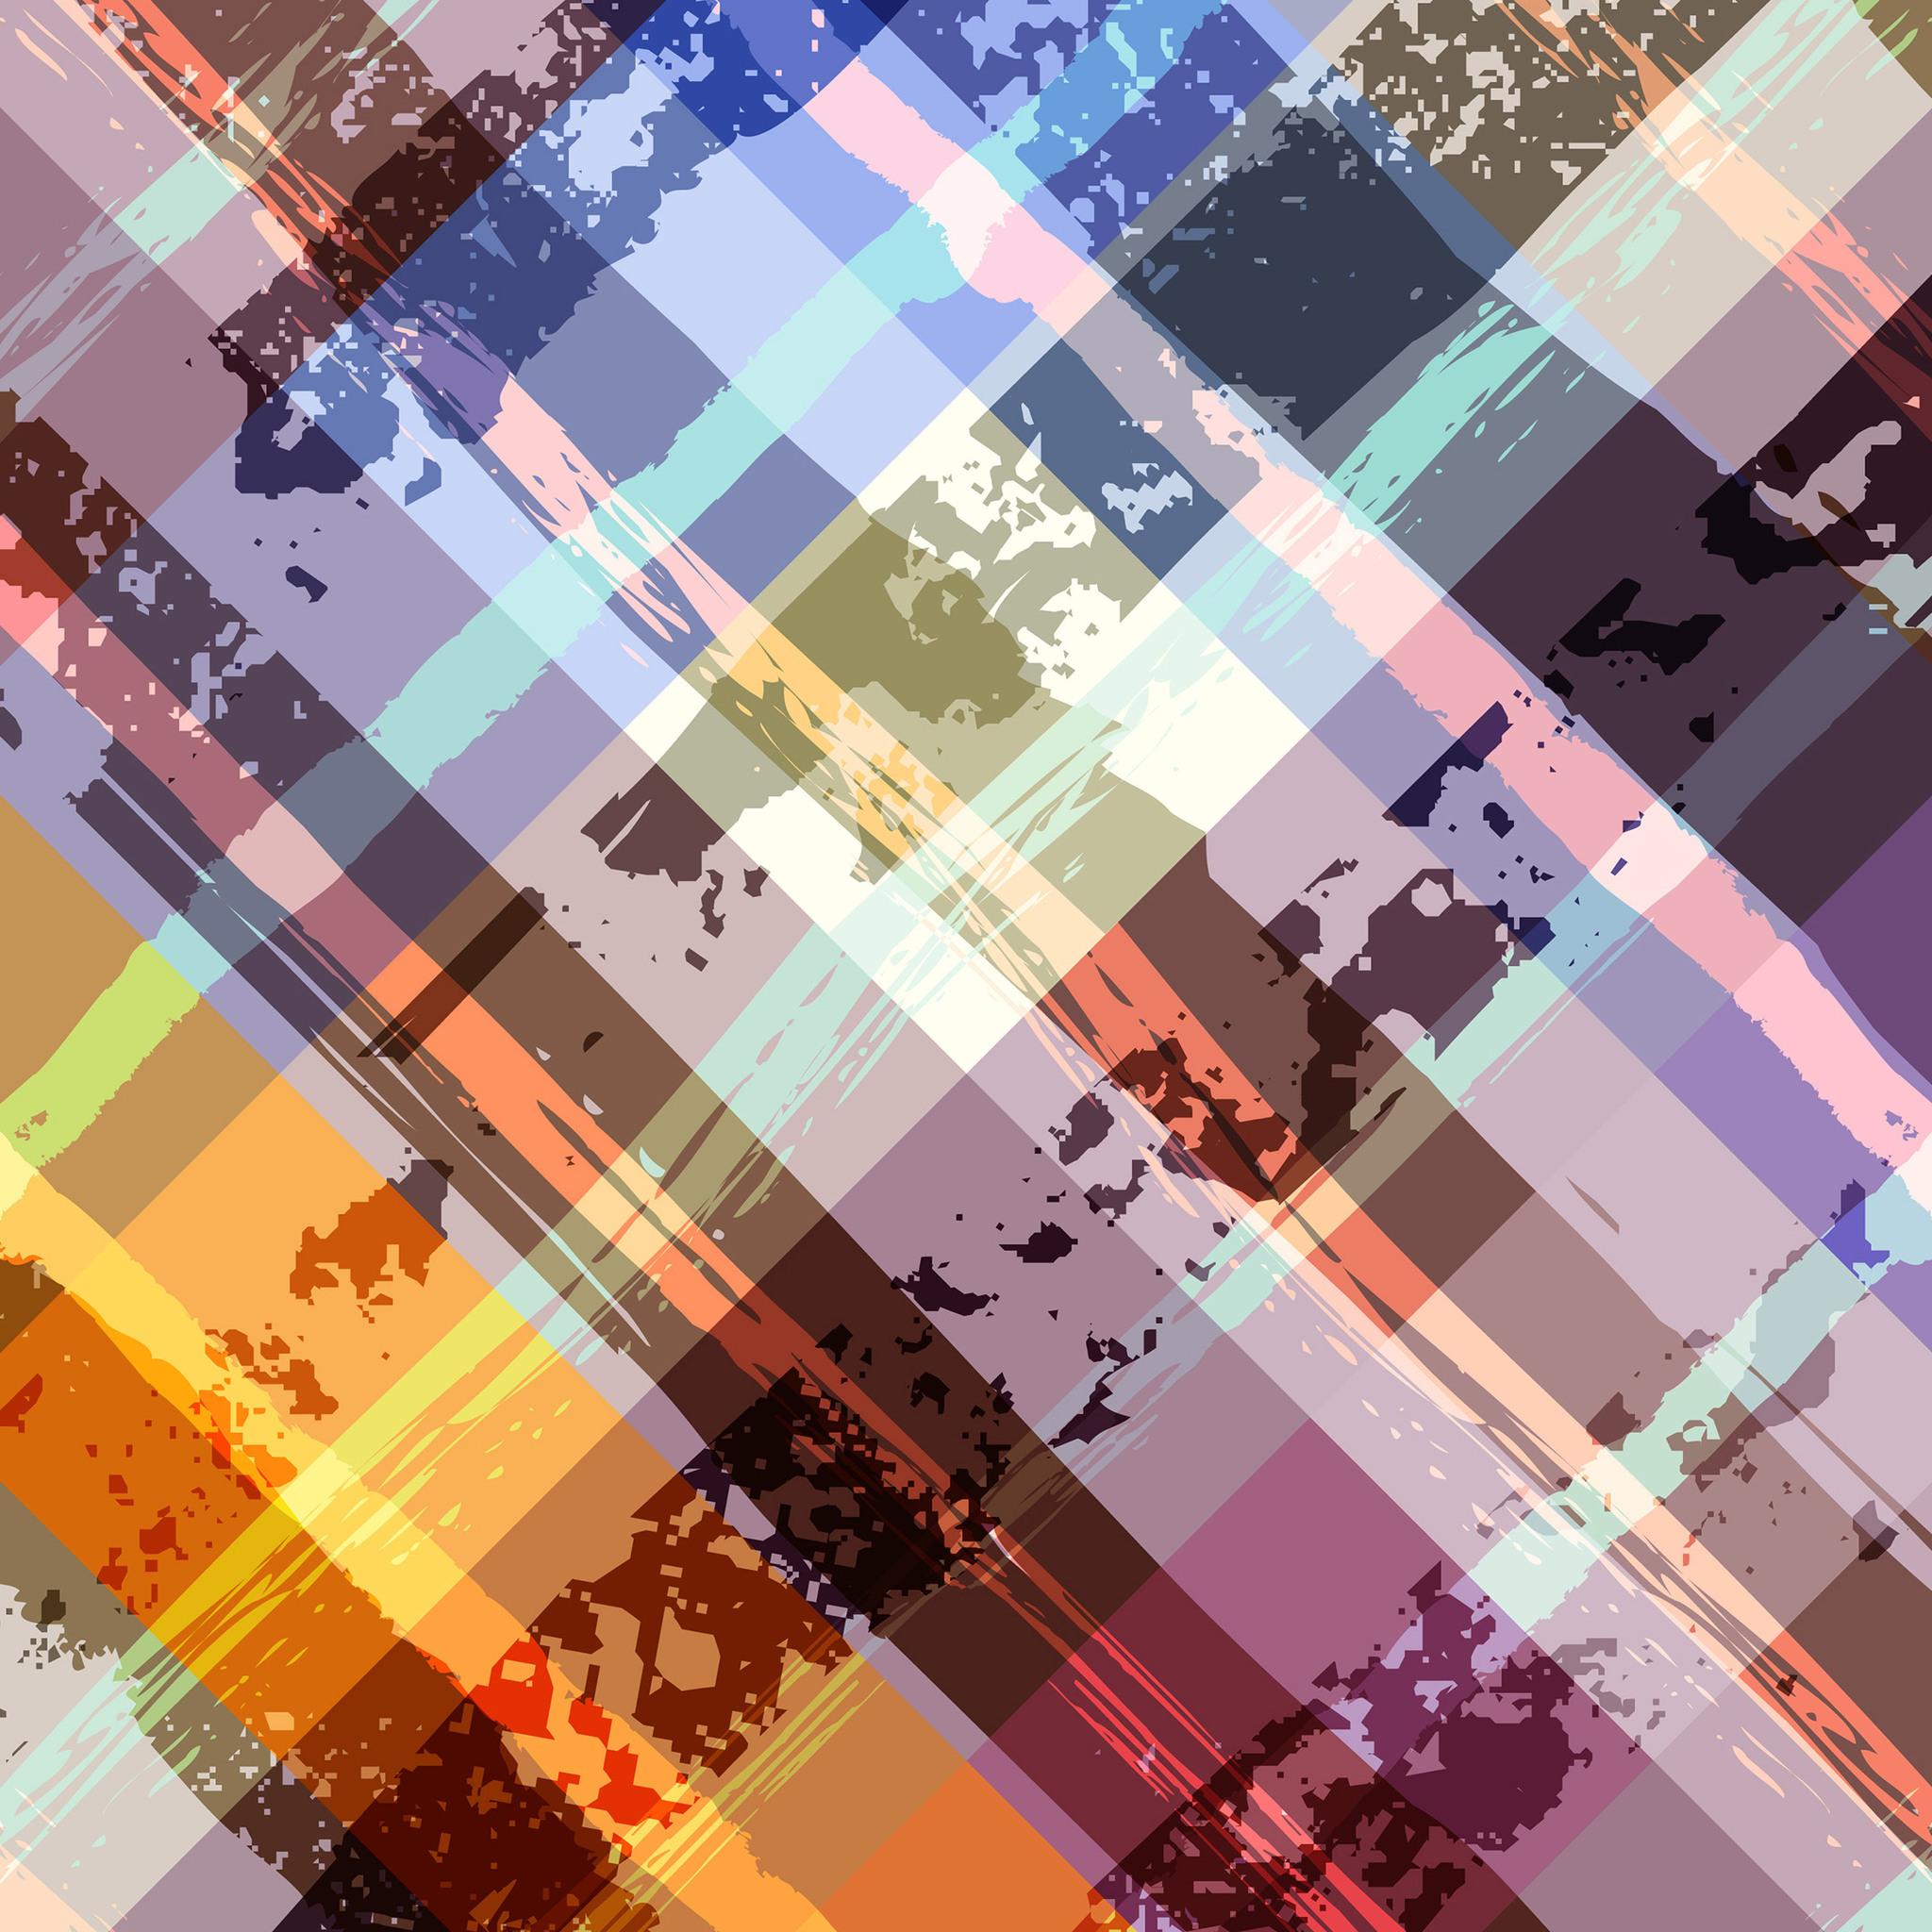 2048x2048 Abstract 4k Ipad Air HD 4k Wallpapers, Images